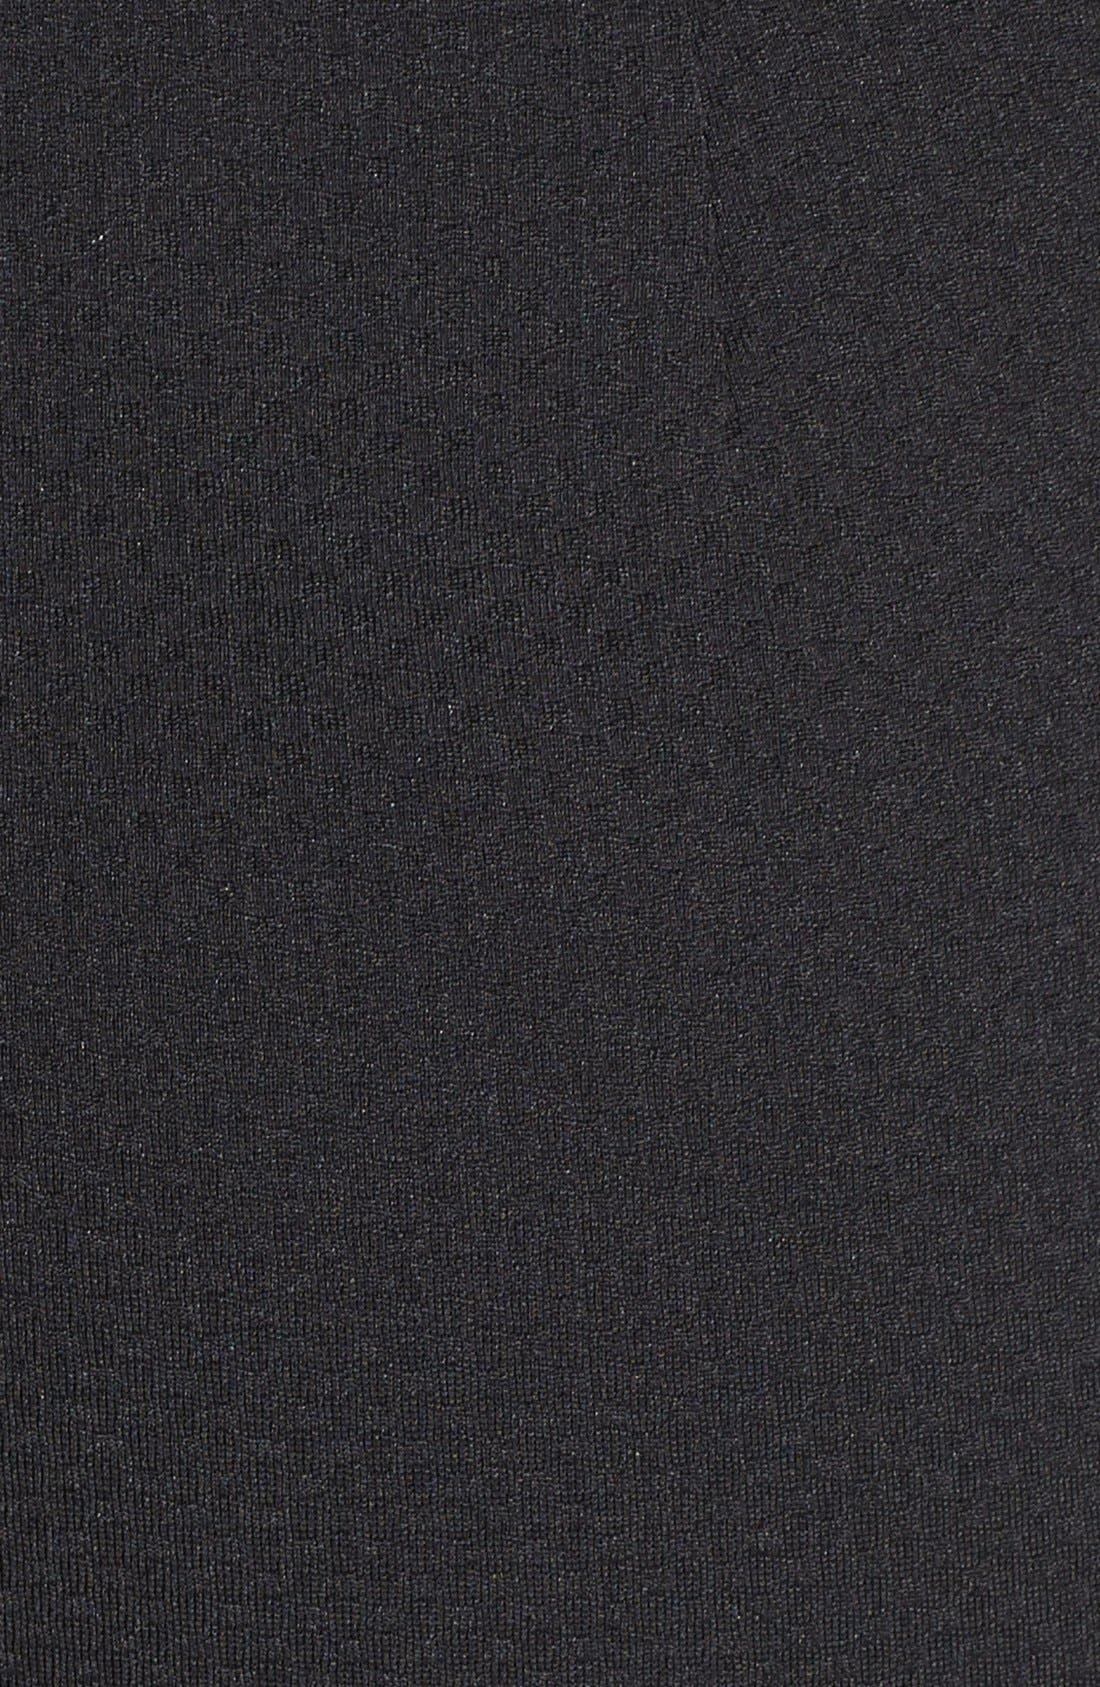 Alternate Image 3  - ASTR Textured Body-Con Dress